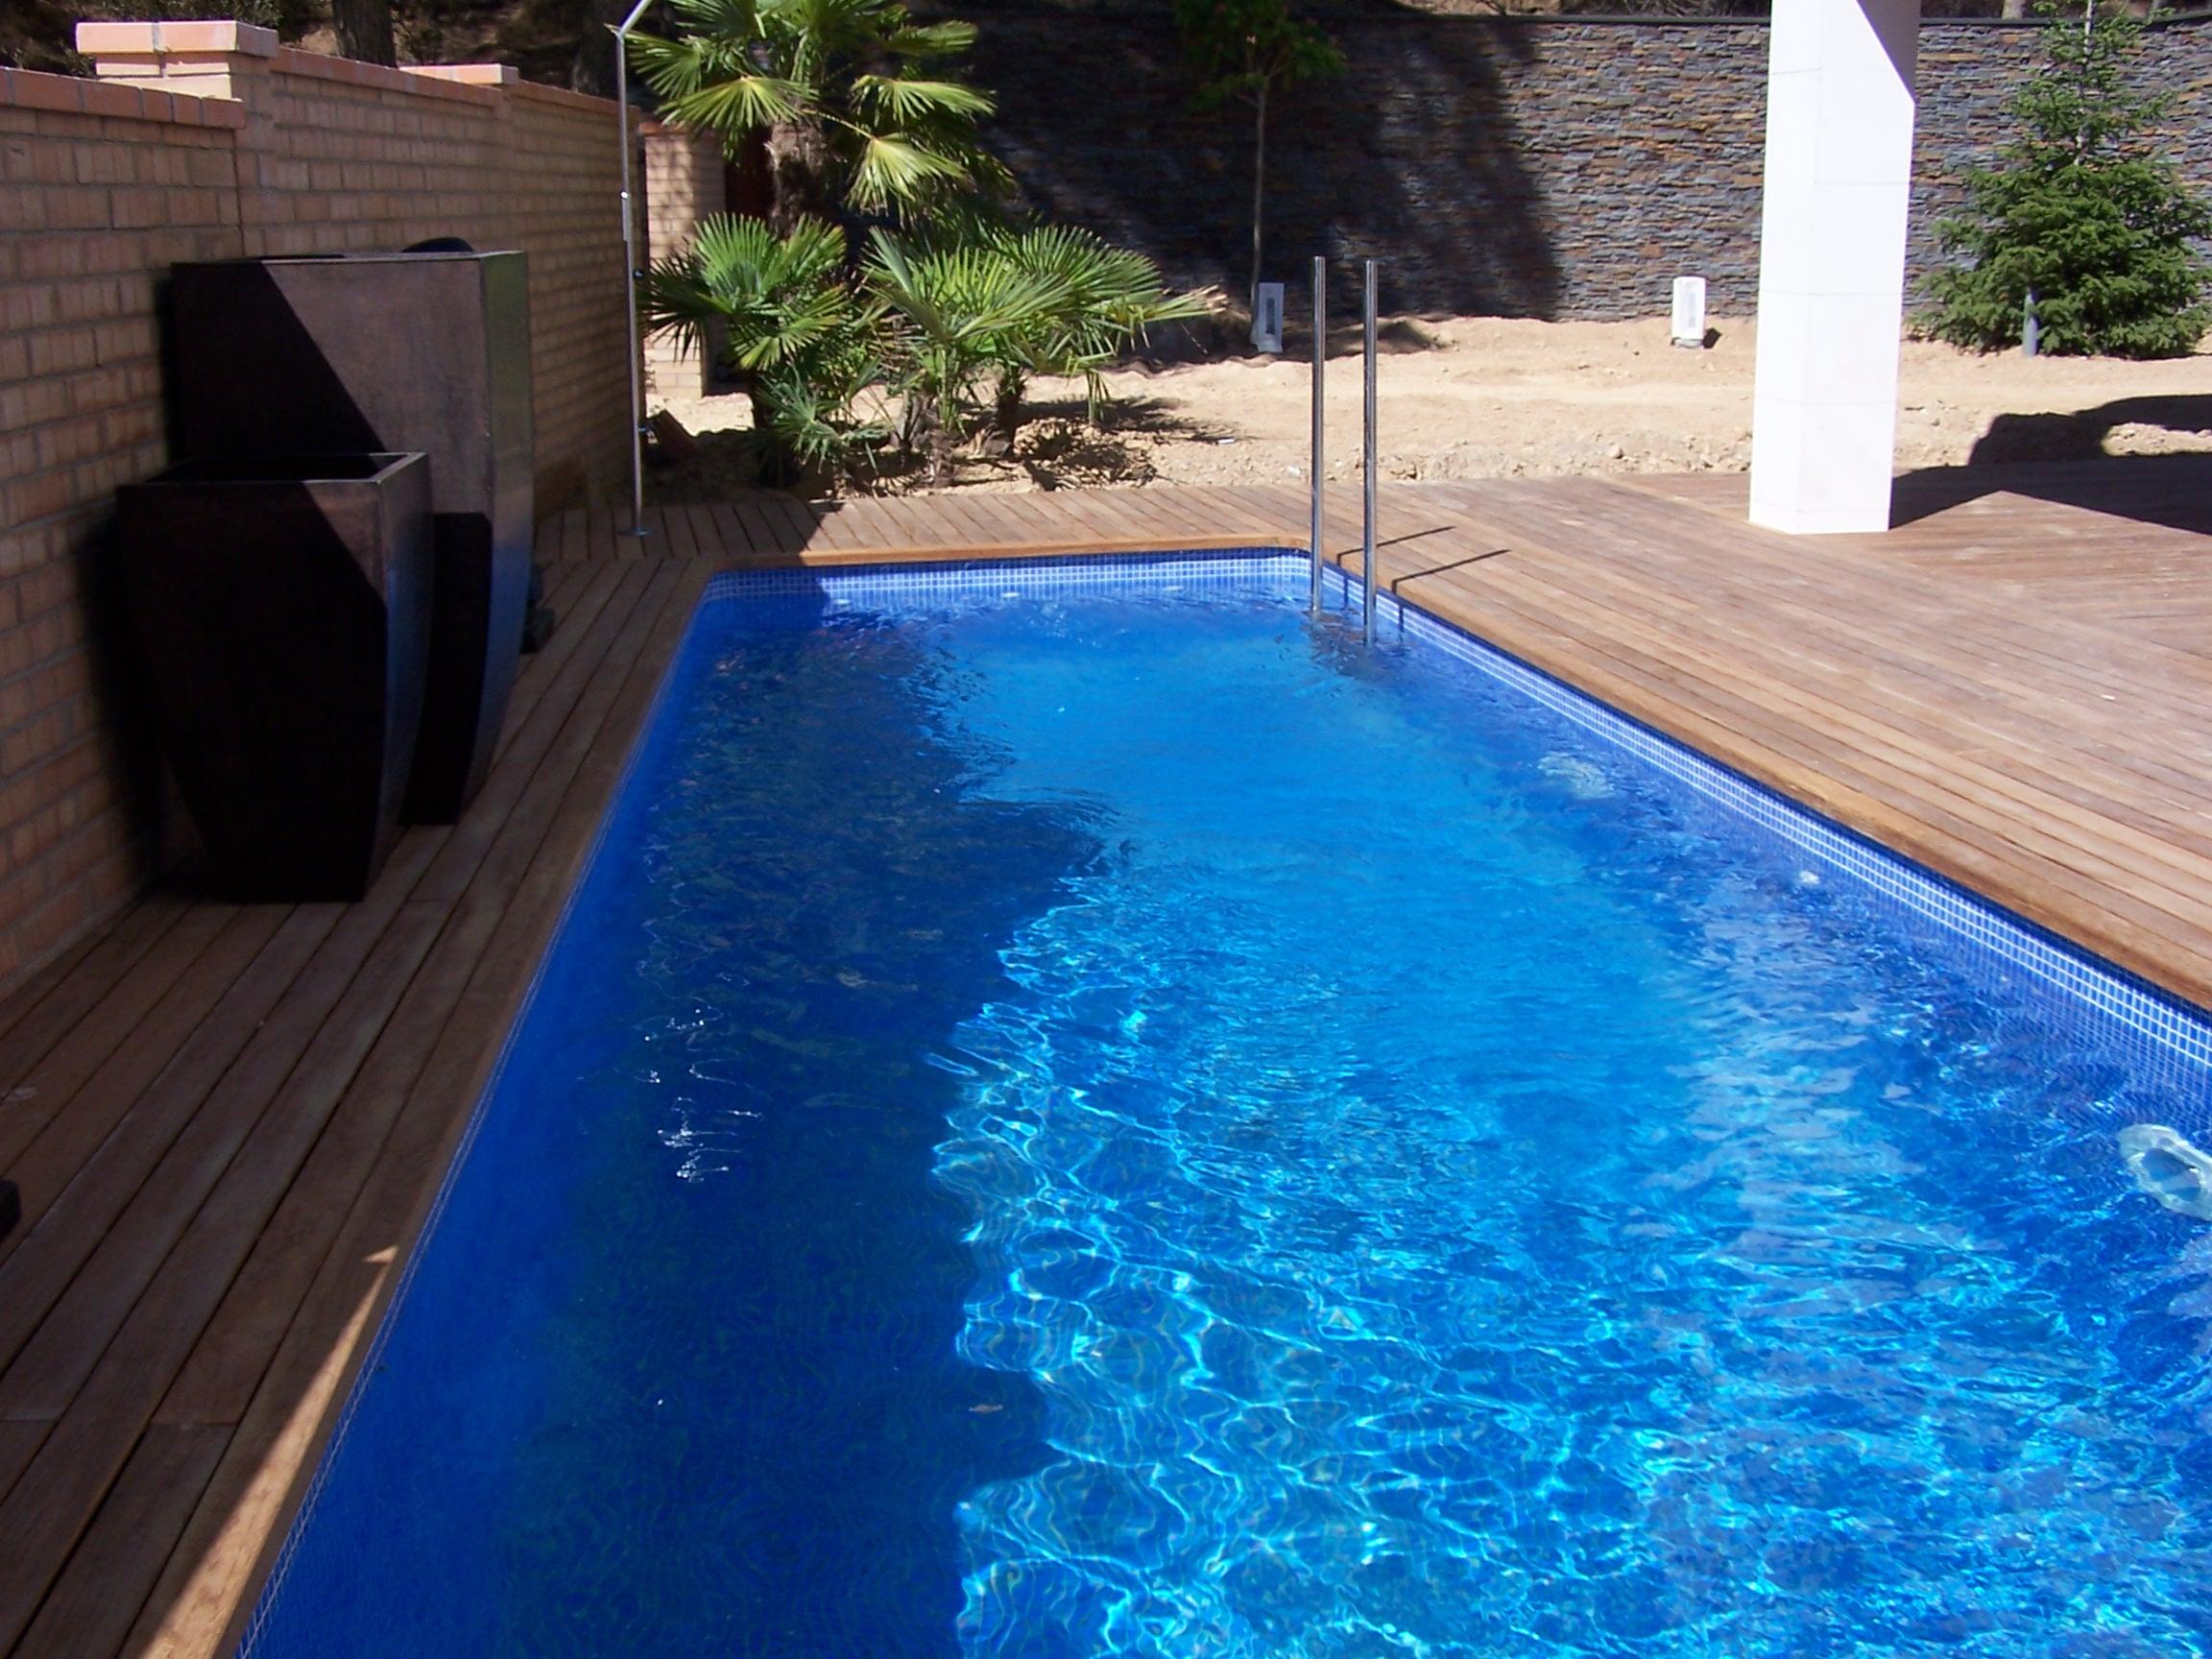 Piscinas de obra codetrac s l expertos en piscinas for Piscinas rectangulares de obra